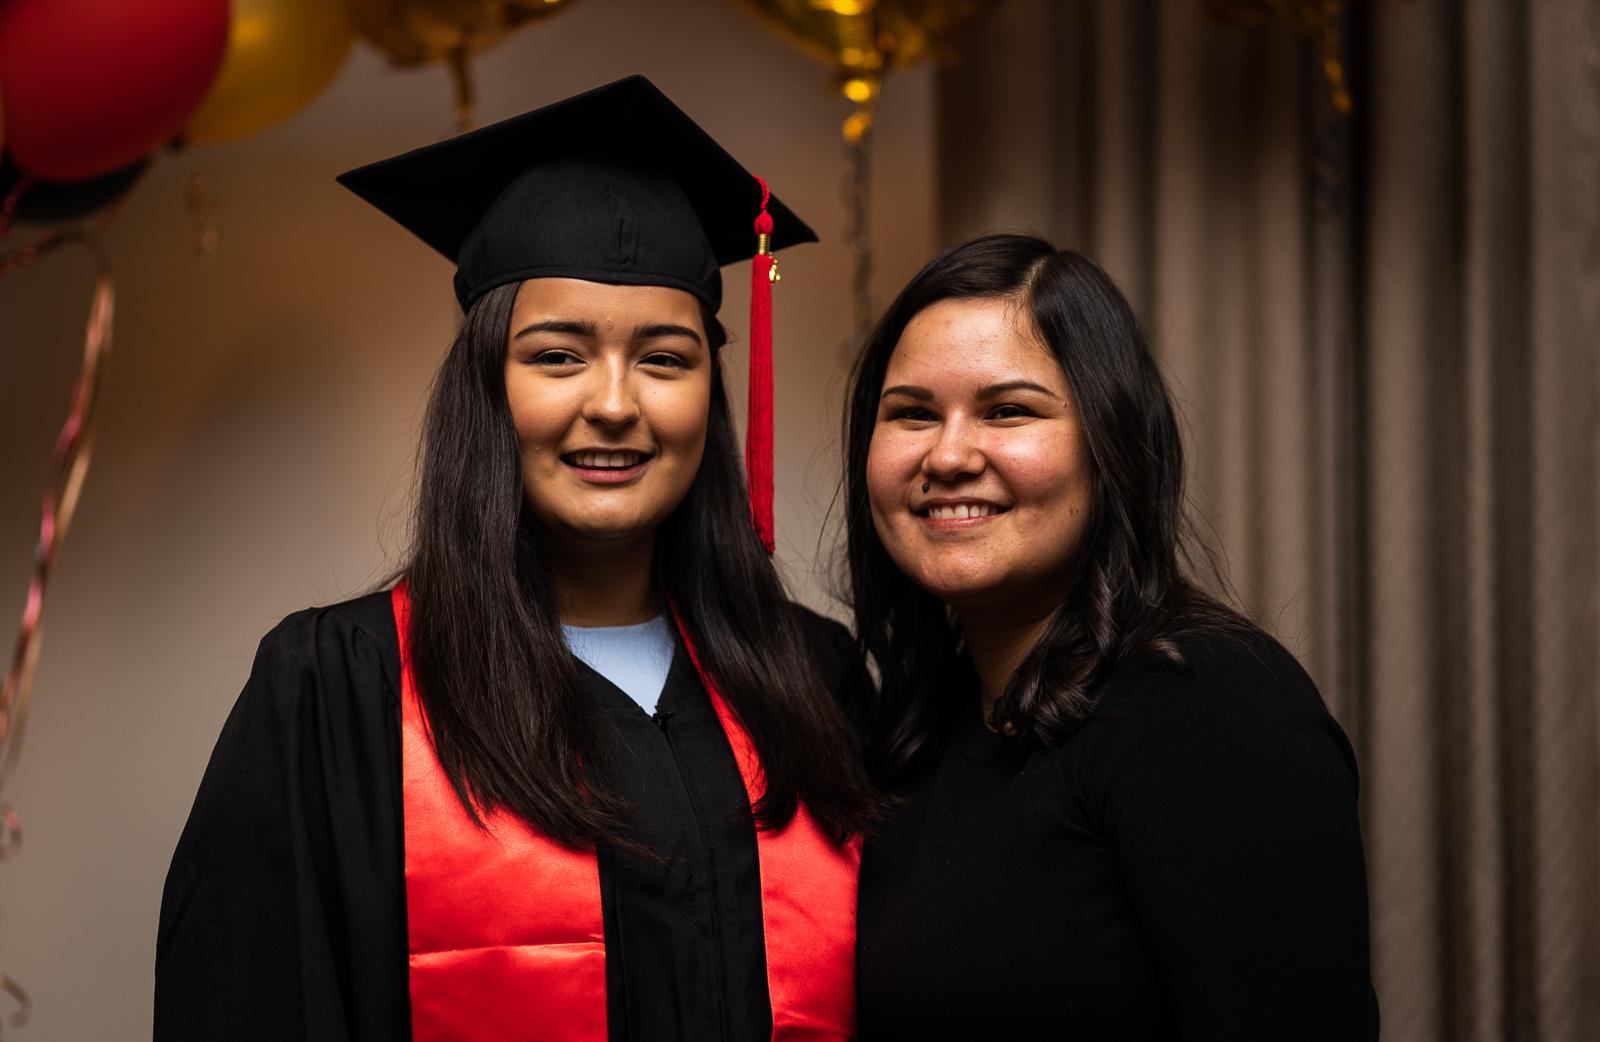 kihs-graduation-2019-fb-24.jpg